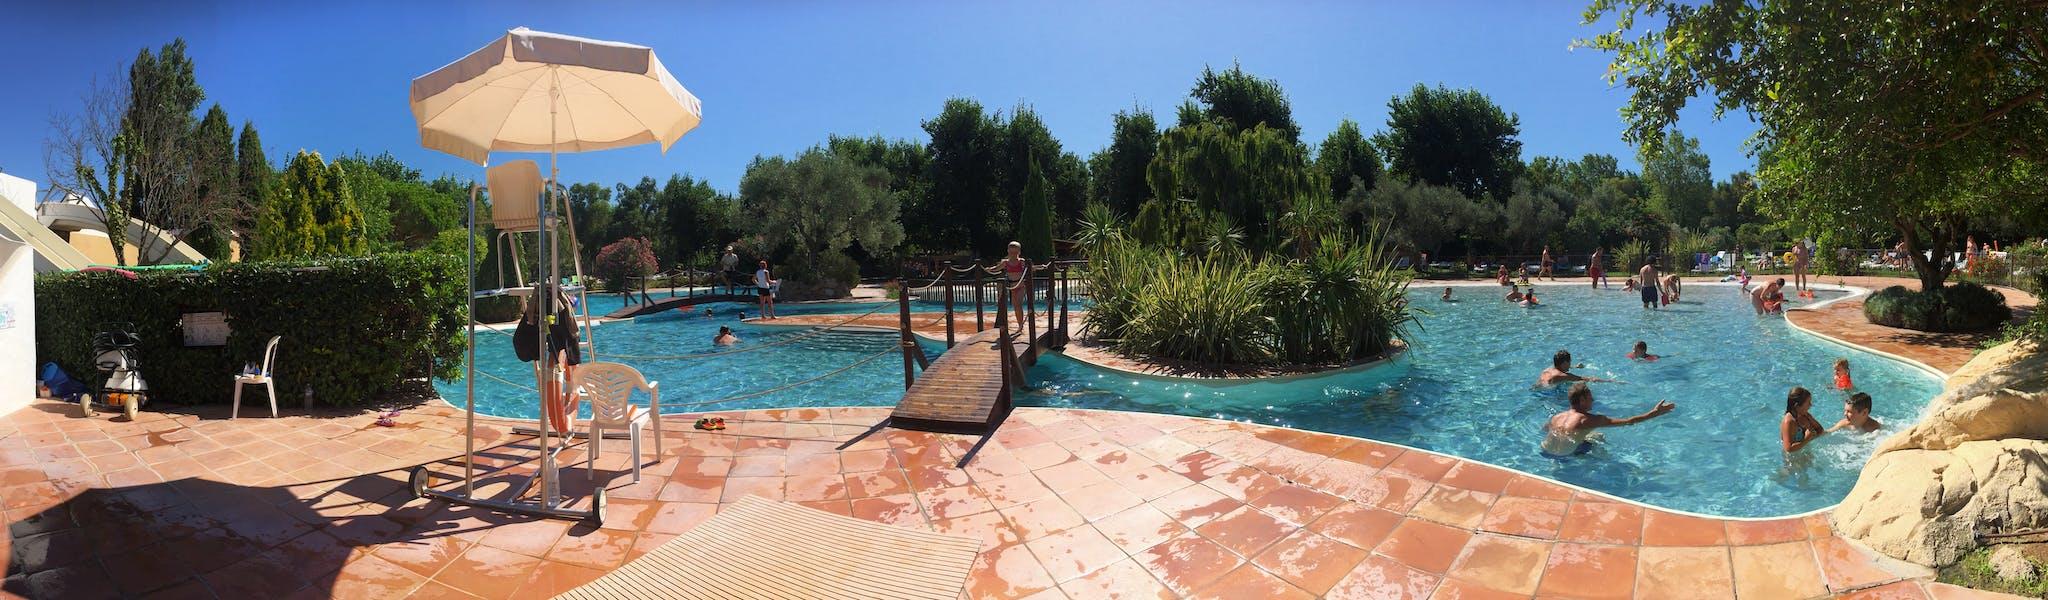 Serignan Plage zwembad panoramafoto